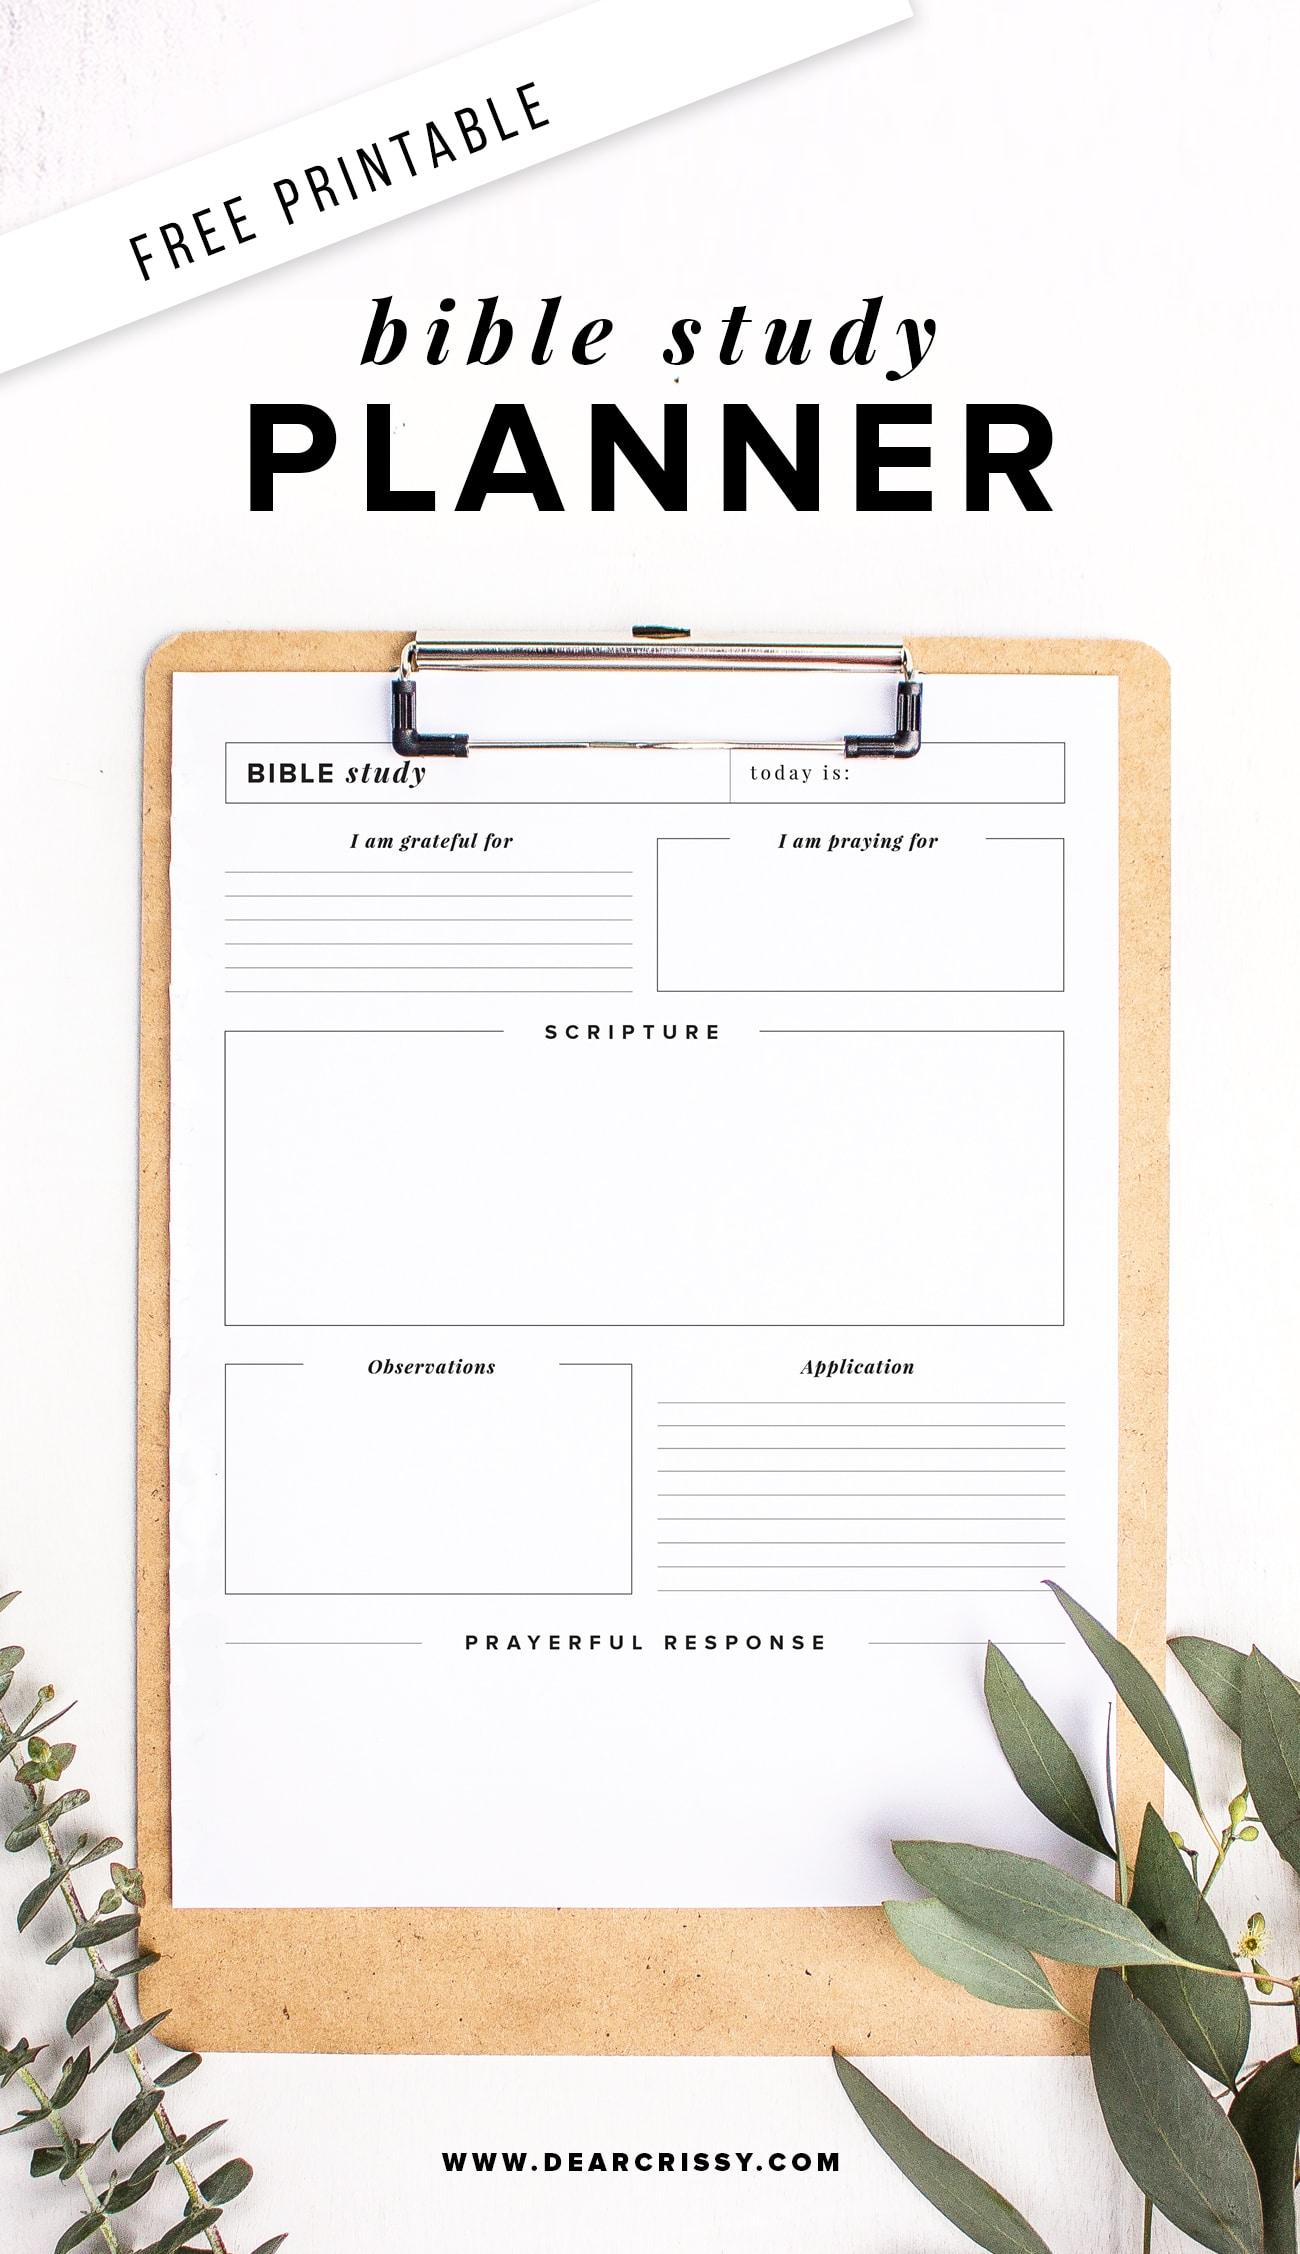 Free Printable Bible Study Planner - Soap Method Bible Study Worksheet! | Free Printable Bible Study Worksheets